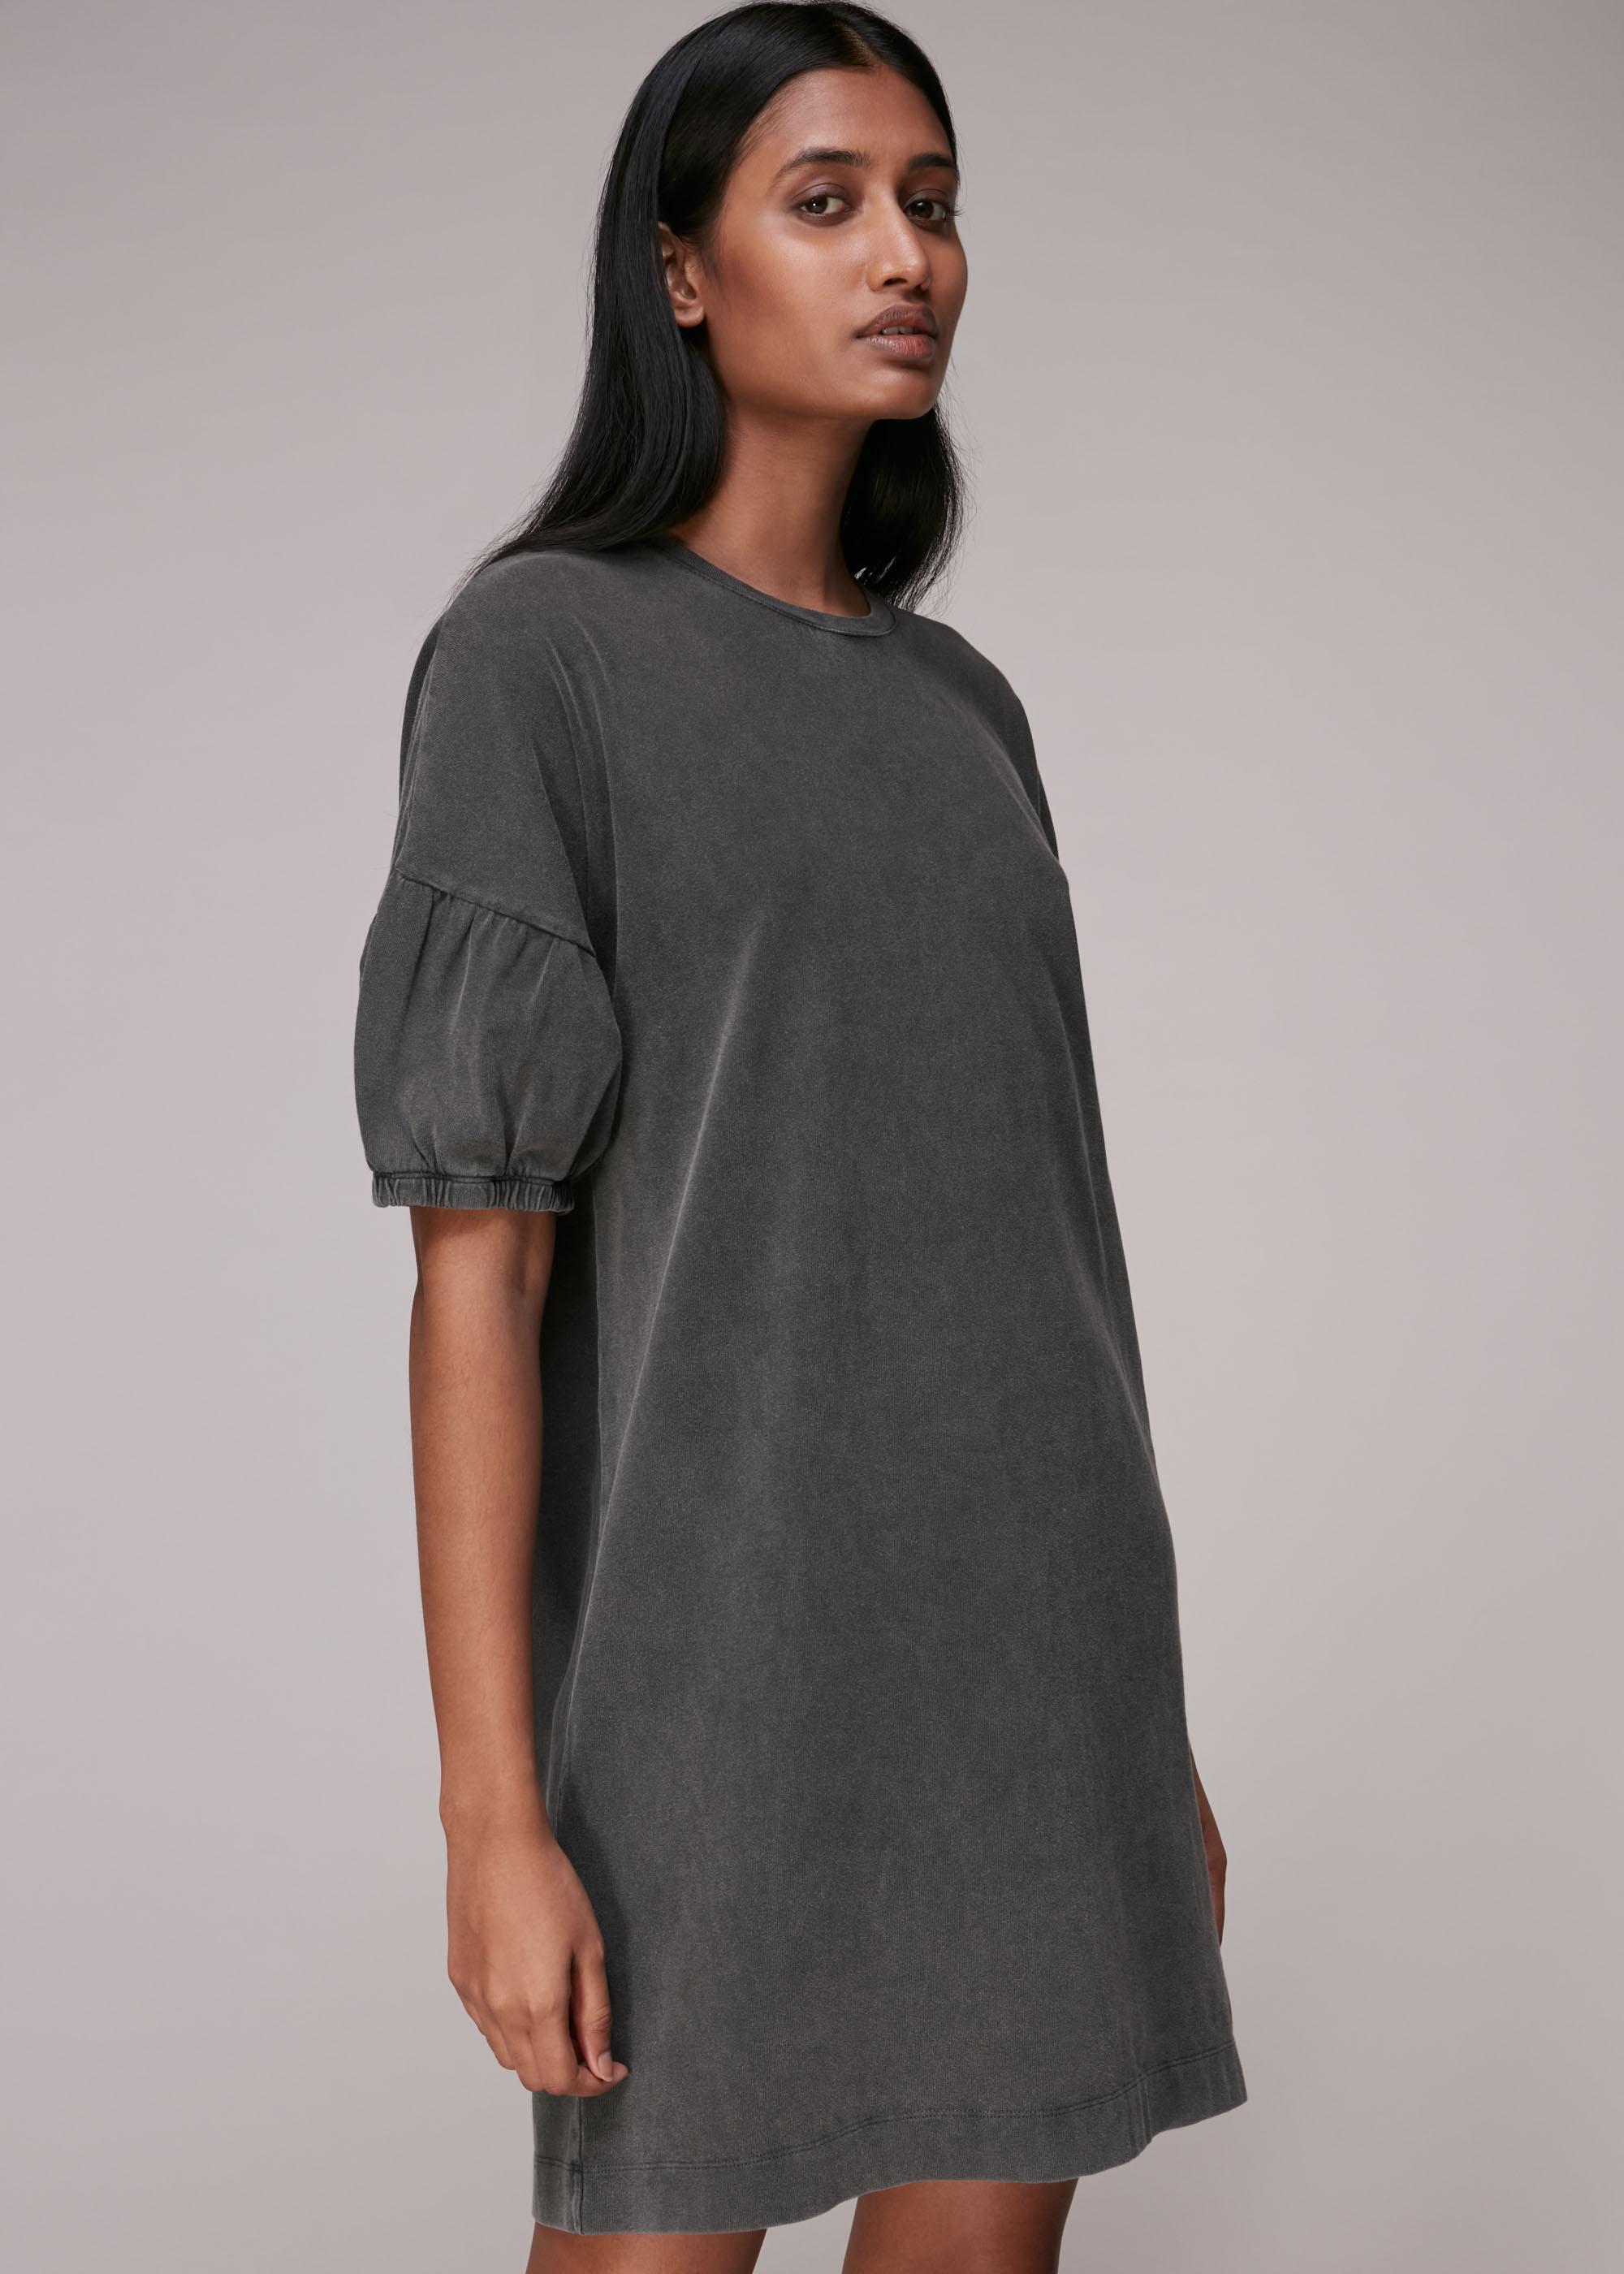 Whistles Women Gathered Sleeve Jersey Dress